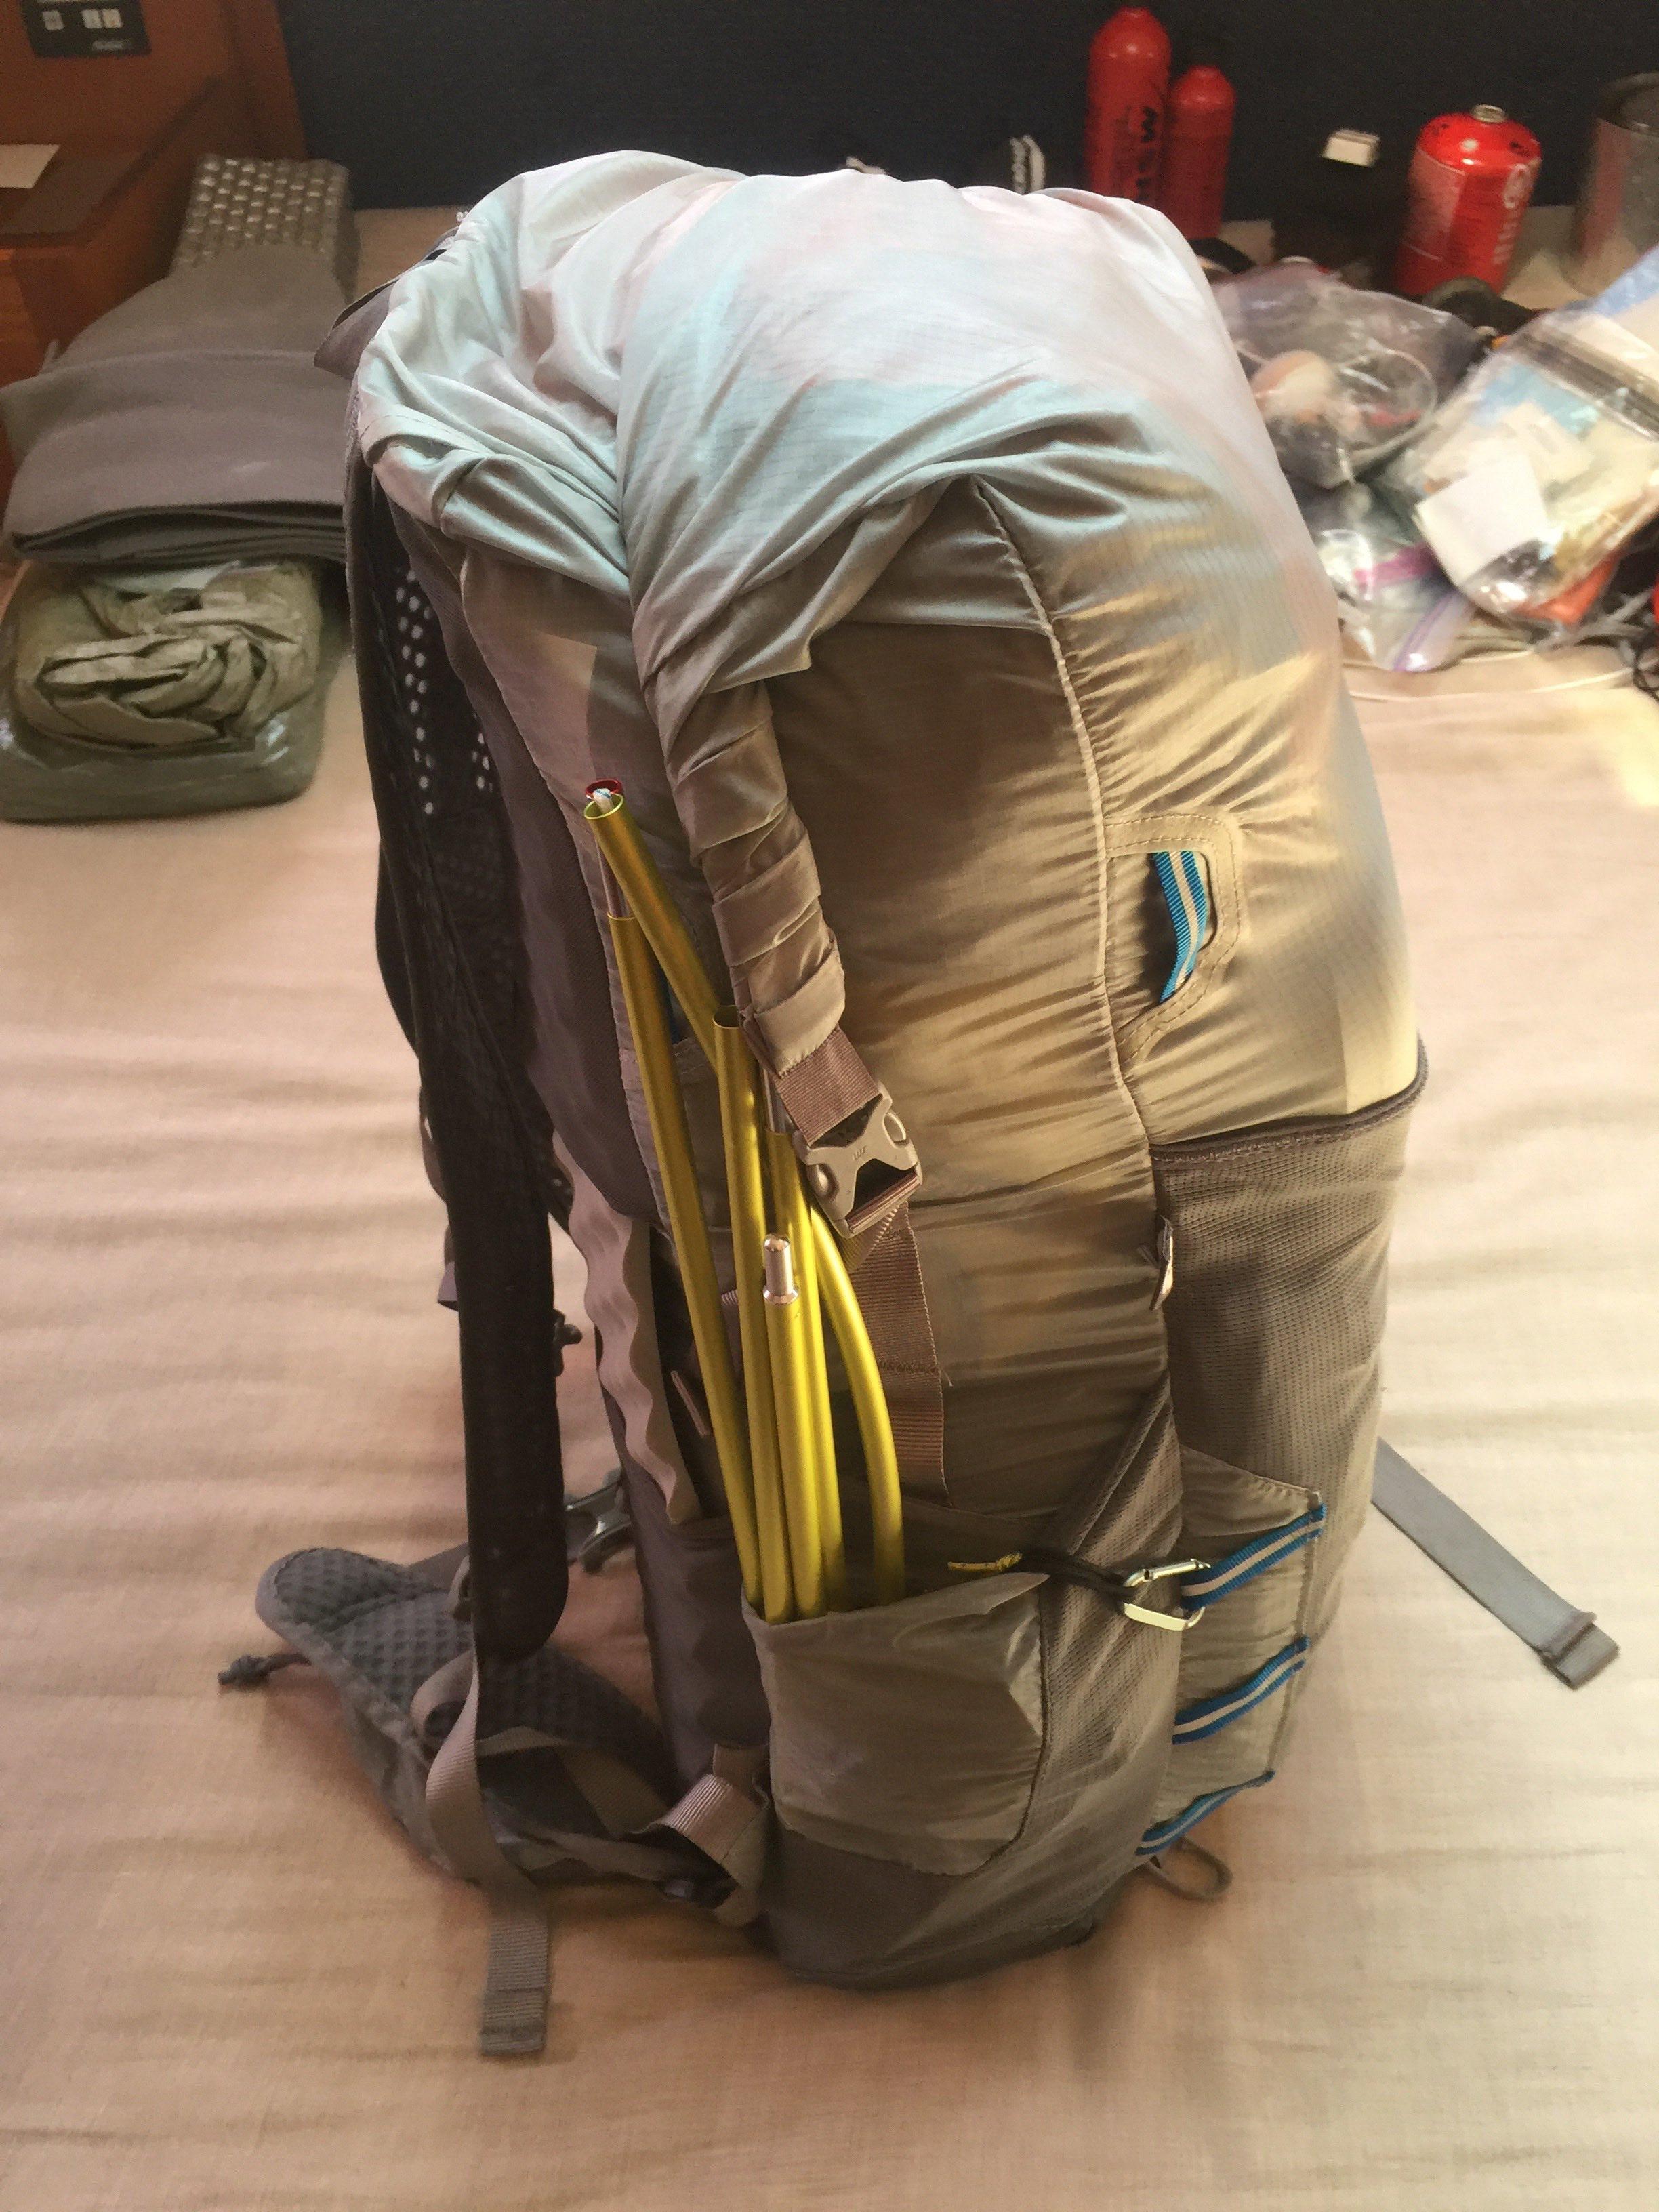 Gossamer Gear Murmur 36 Hyperlight Backpack